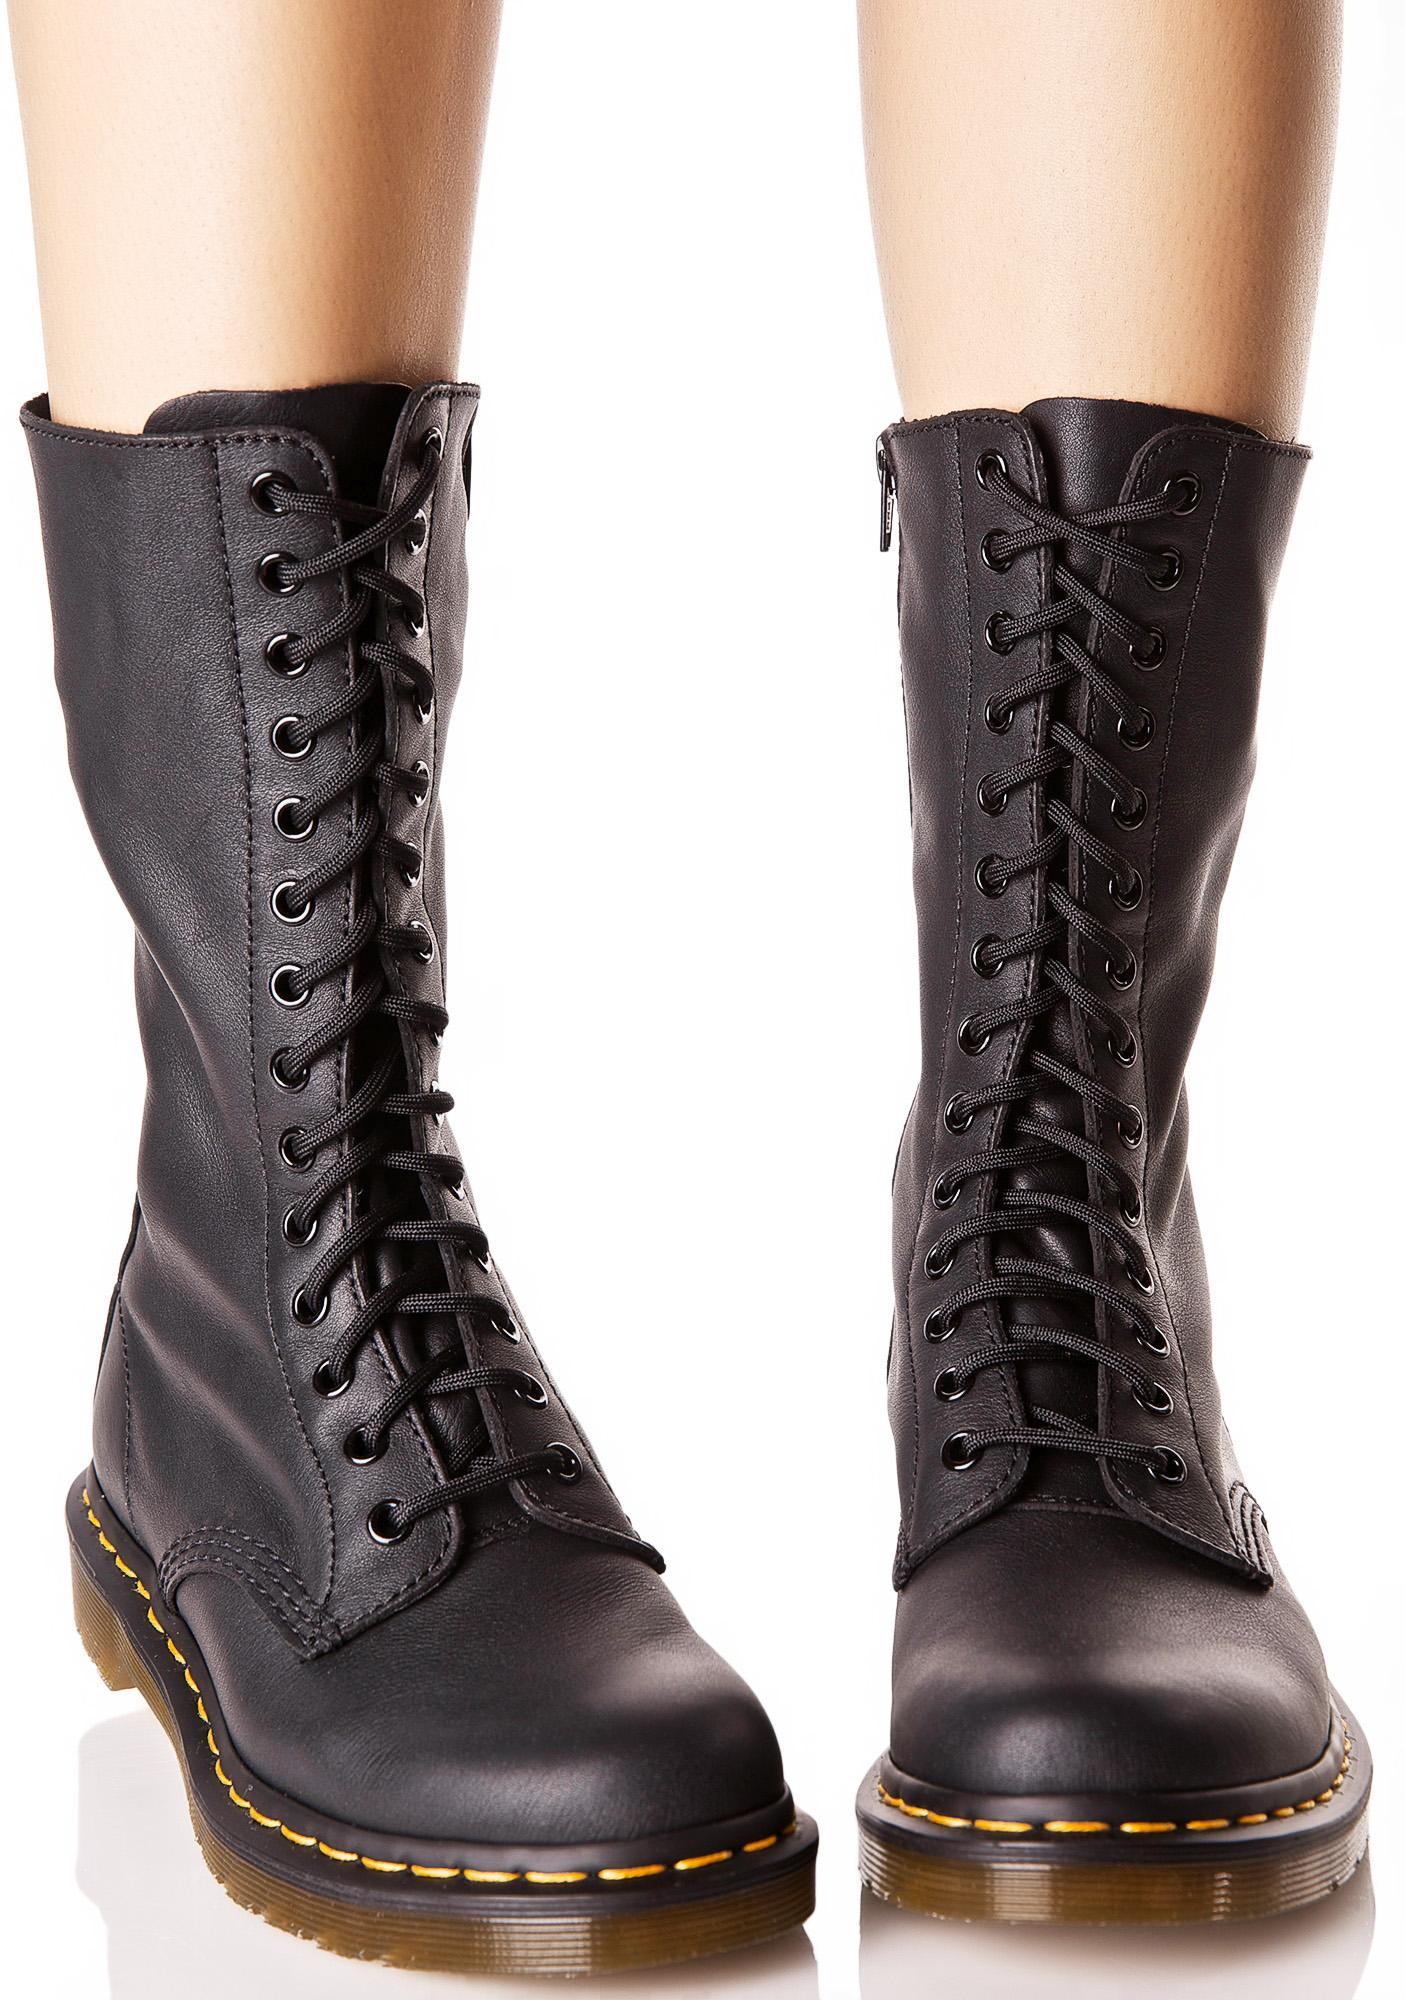 Dr Martens 1b99 14 Eye Boots Dolls Kill